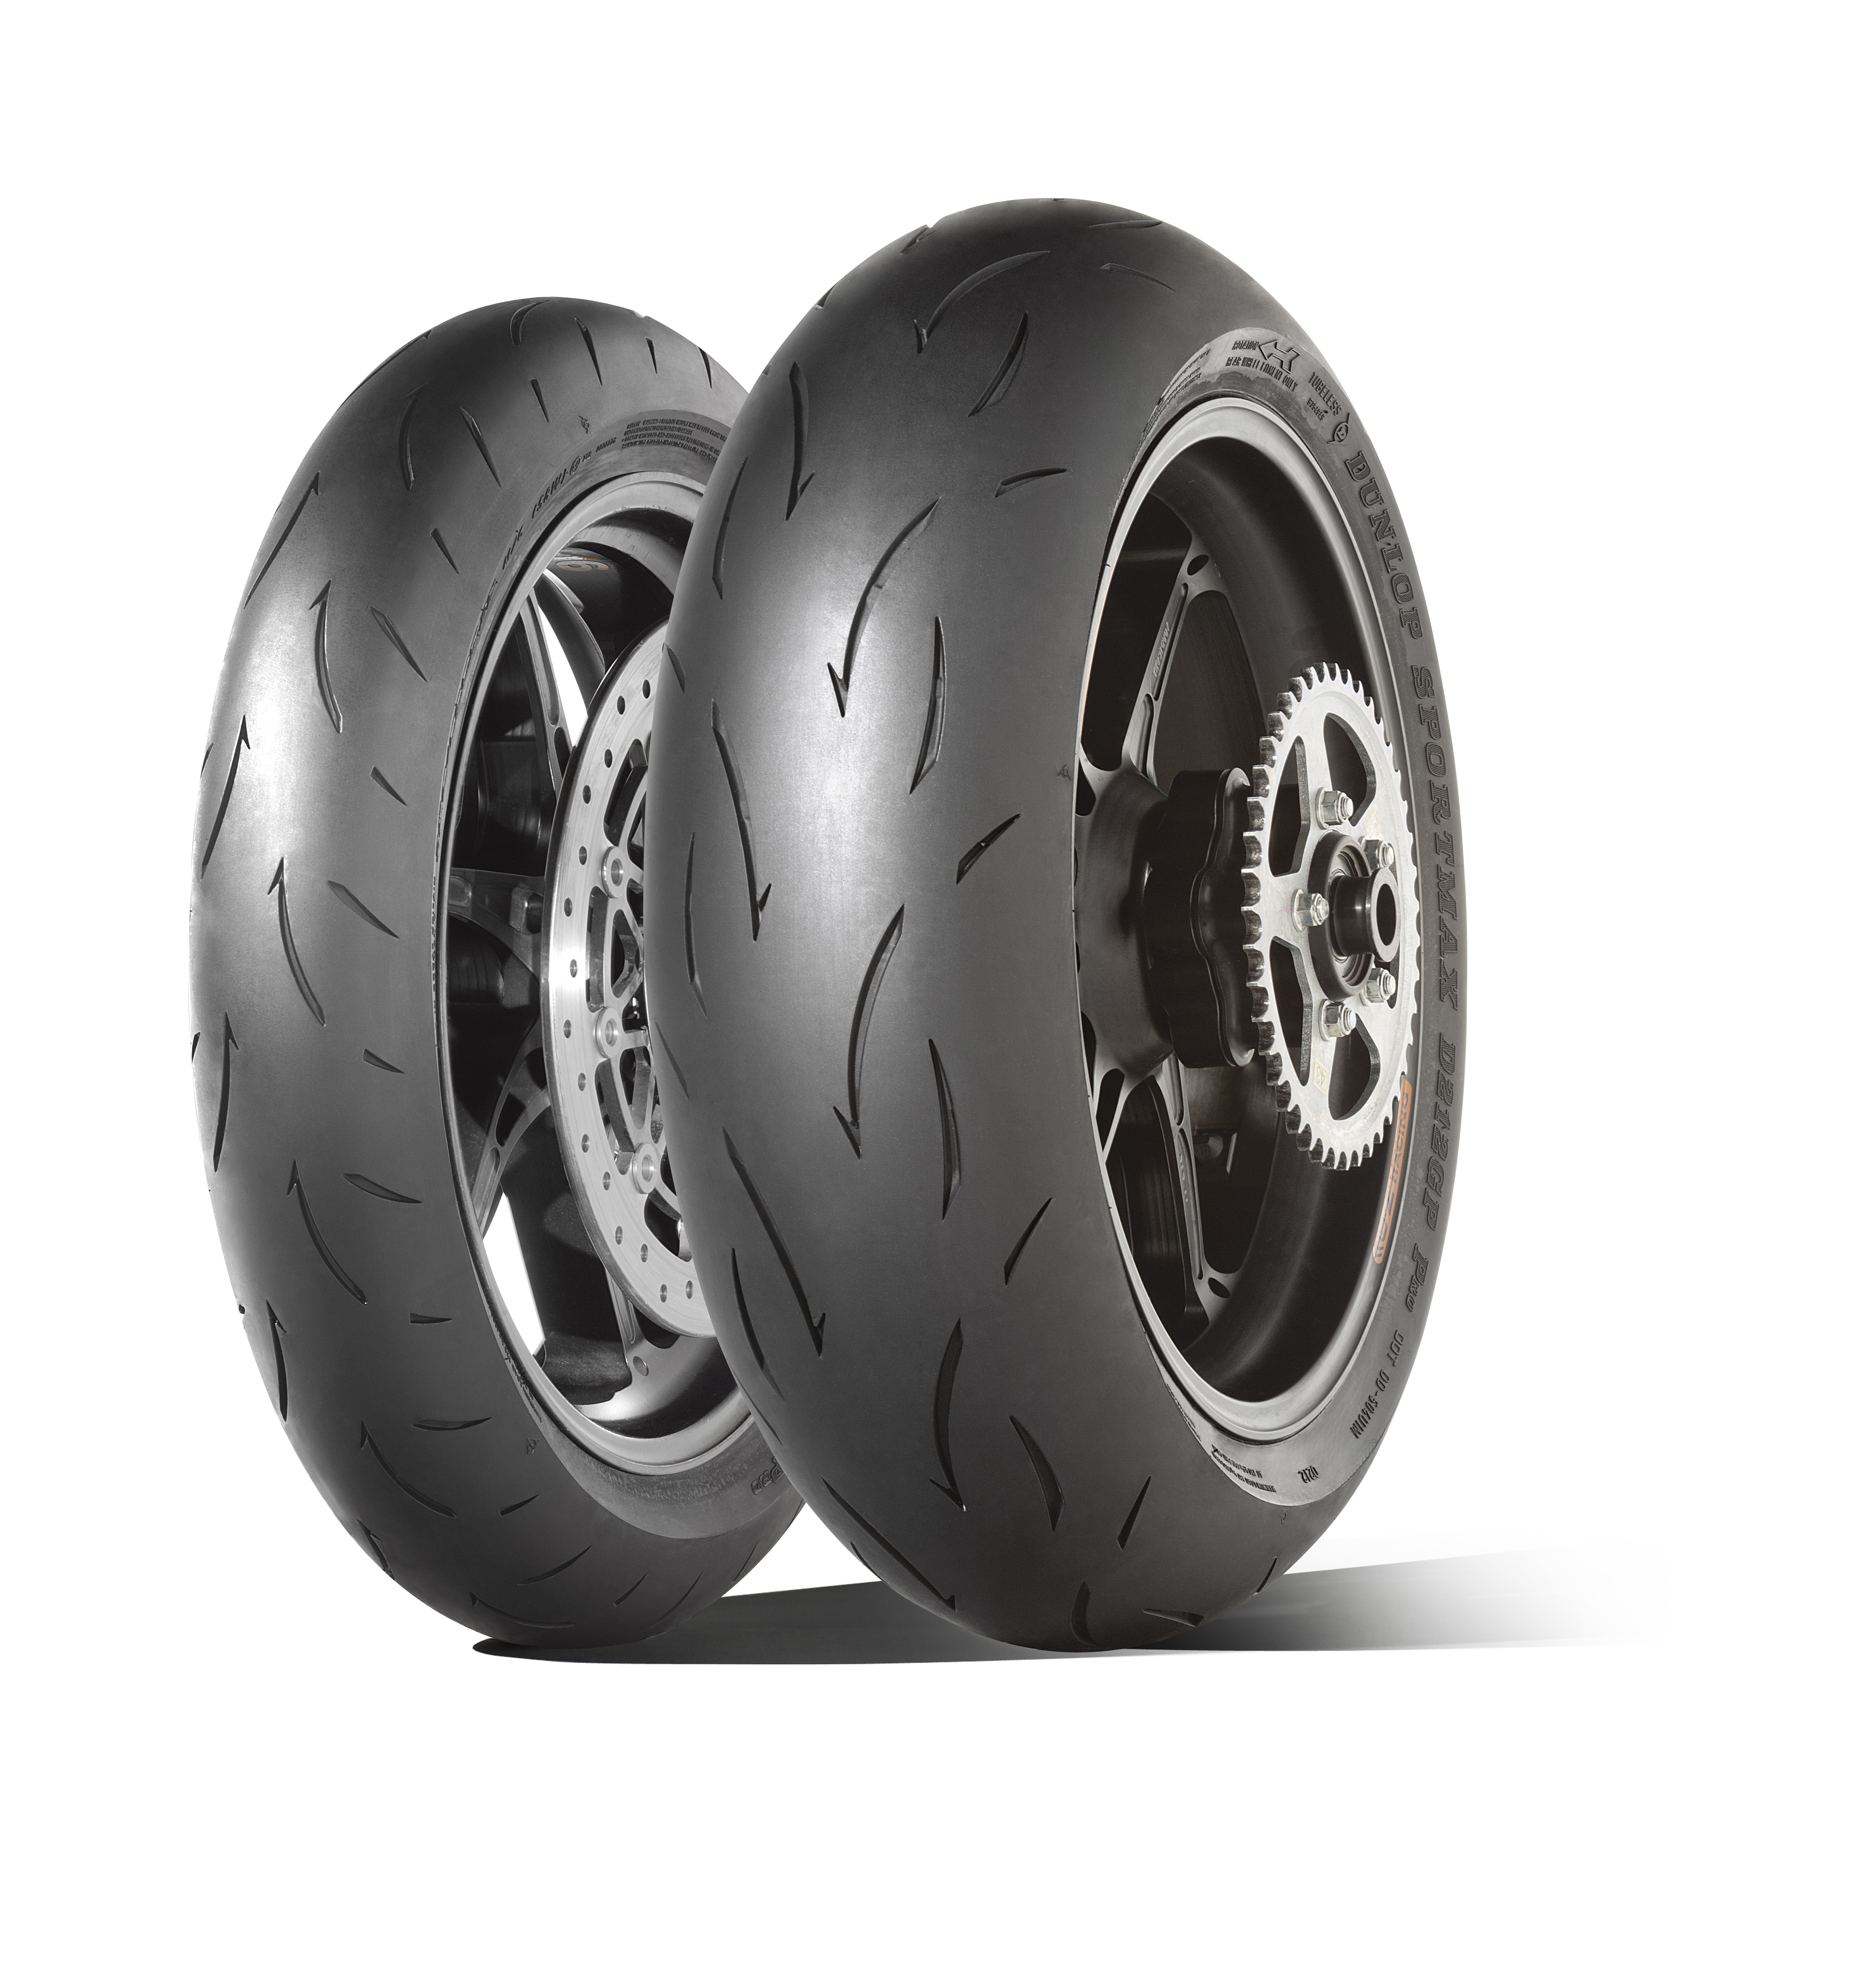 мотошины Dunlop Sportmax D212 GP Pro MS1 120/70 R17 58W